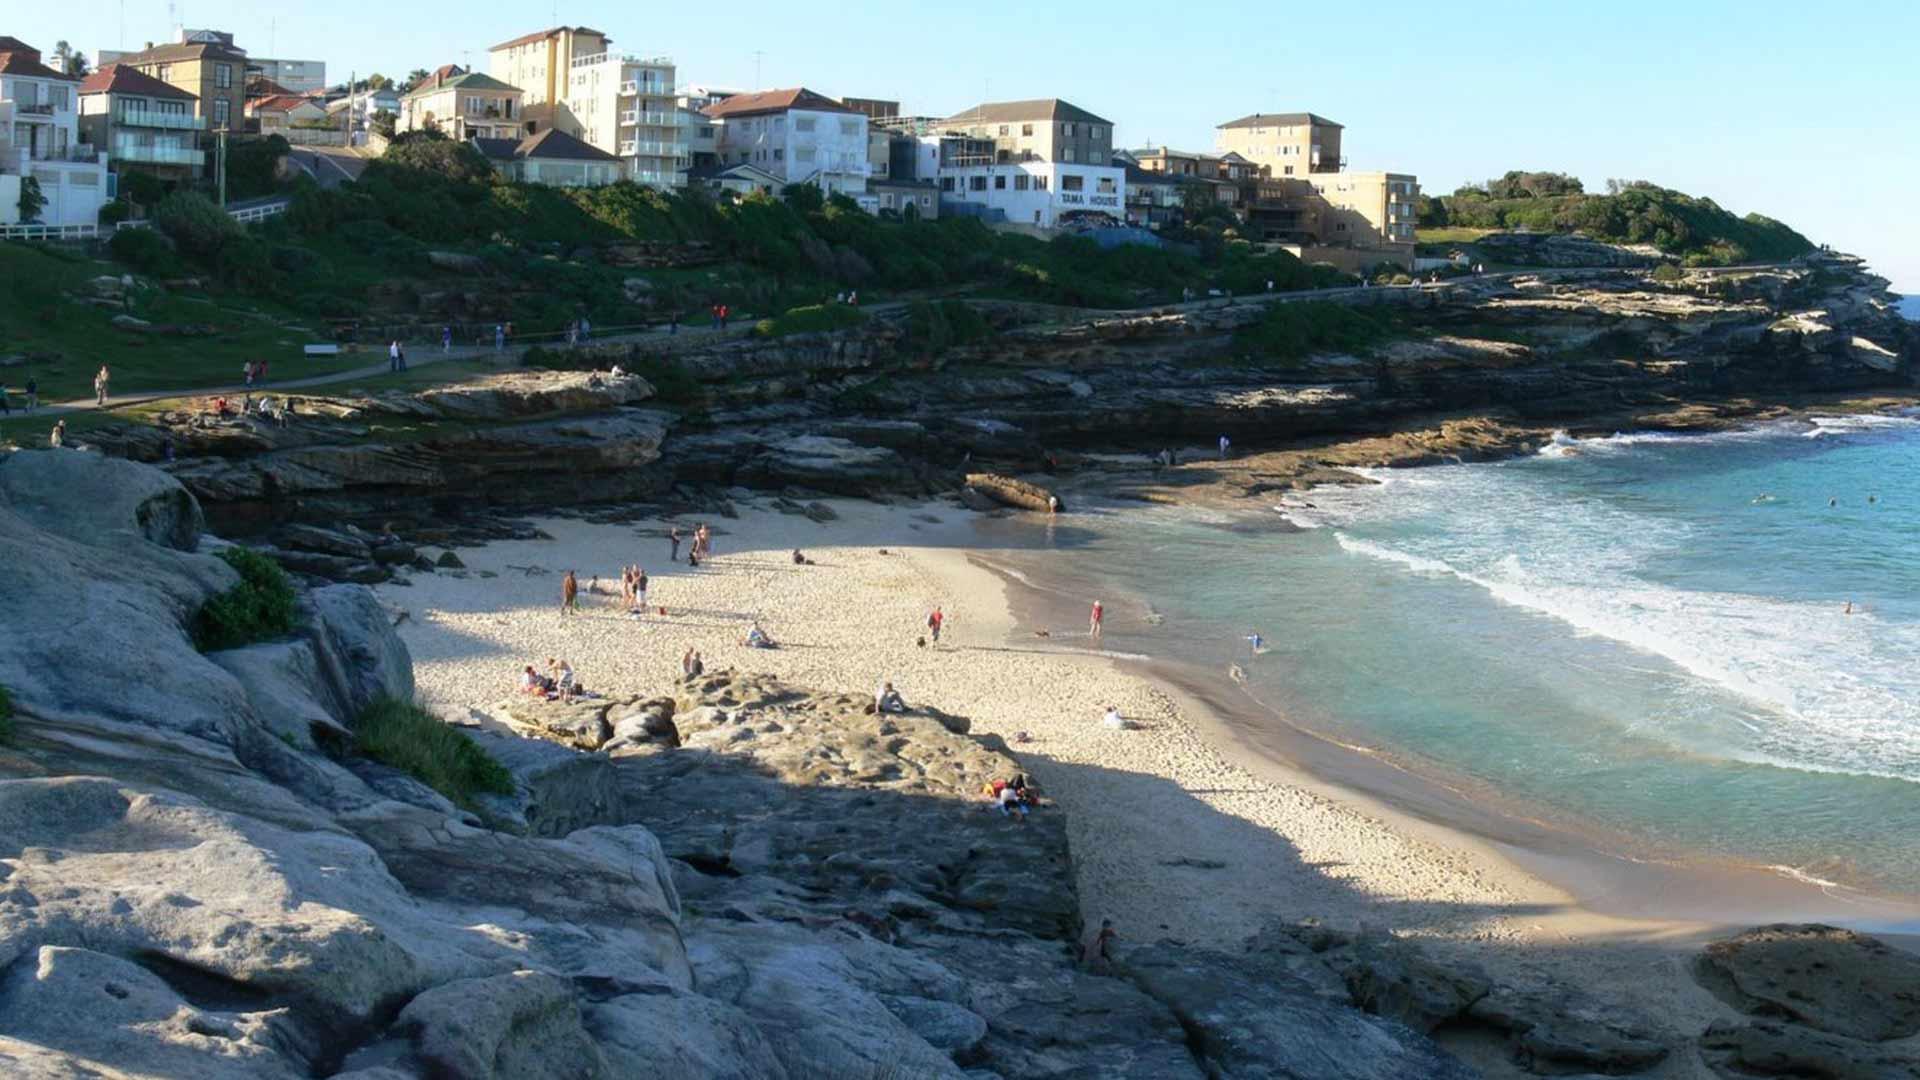 Sydney's Disappearing MacKenzies Bay Beach Has Made a Triumphant Return